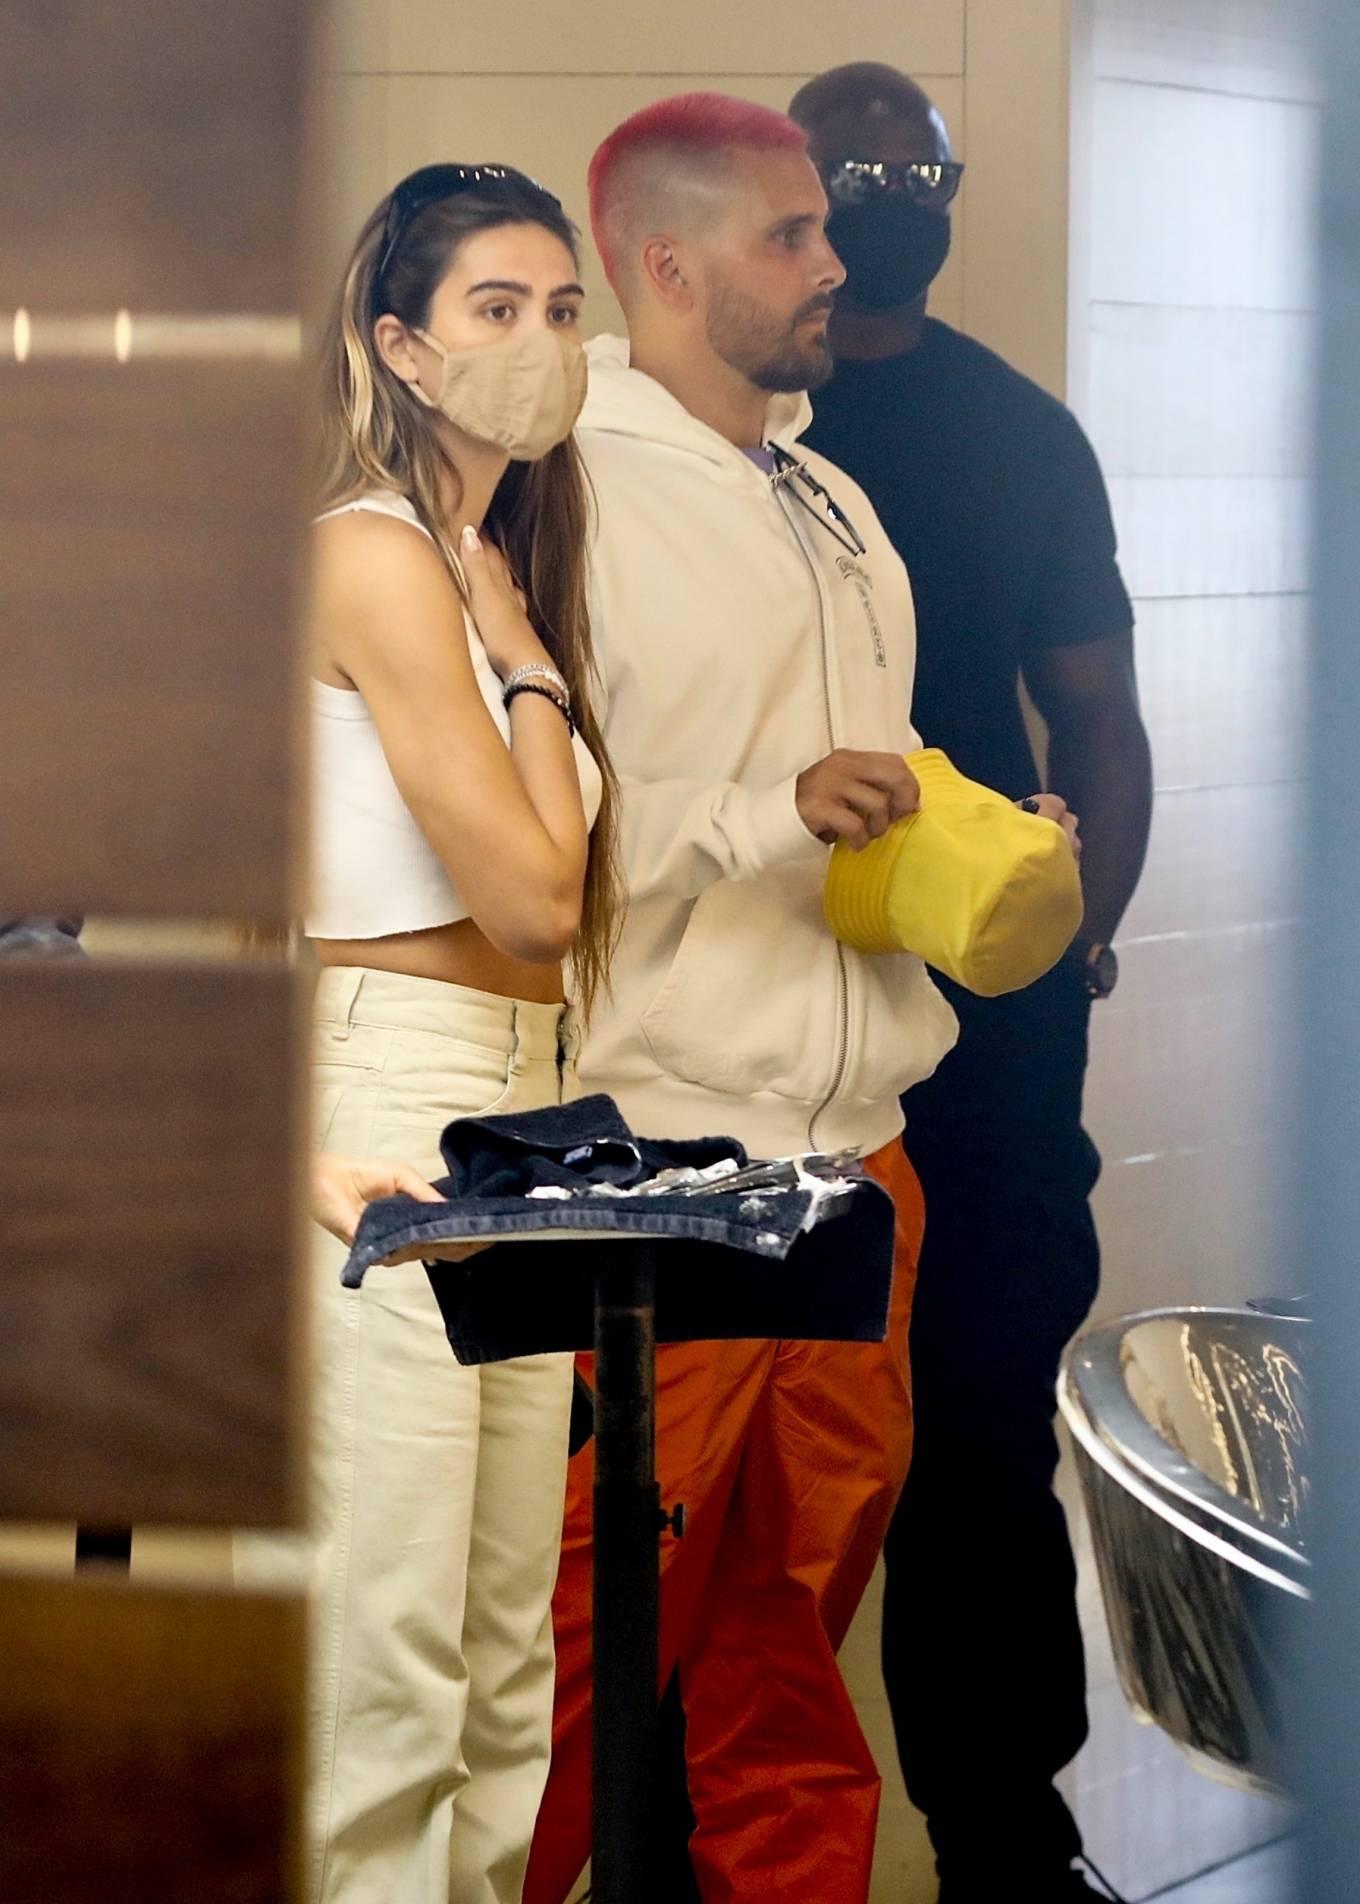 Amelia Hamlin 2021 : Amelia Hamlin – Seen with Scott Disick as they visit Meche Salon in Beverly Hills-05